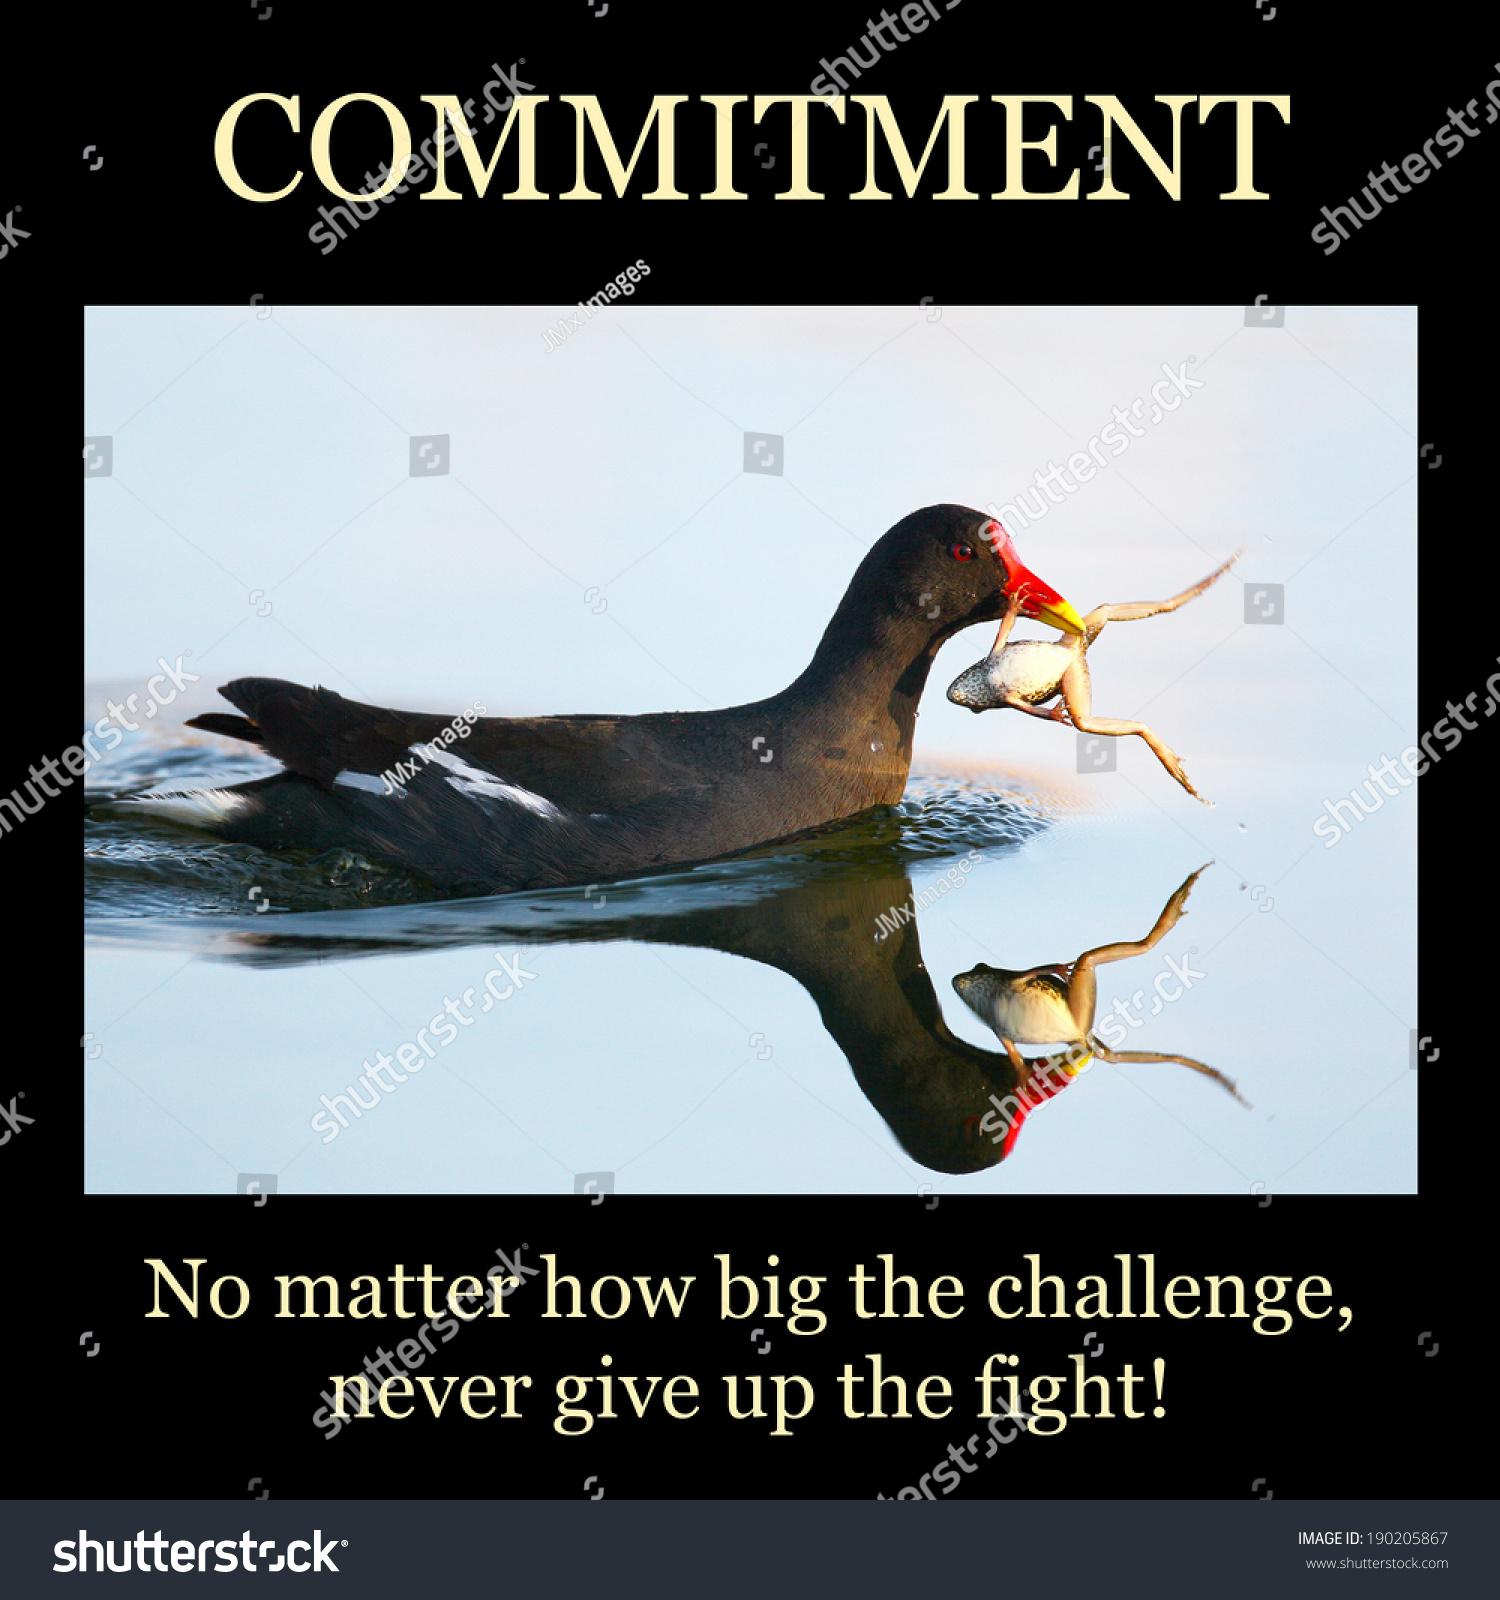 inspirational poster commitment frog fighting back stock. Black Bedroom Furniture Sets. Home Design Ideas